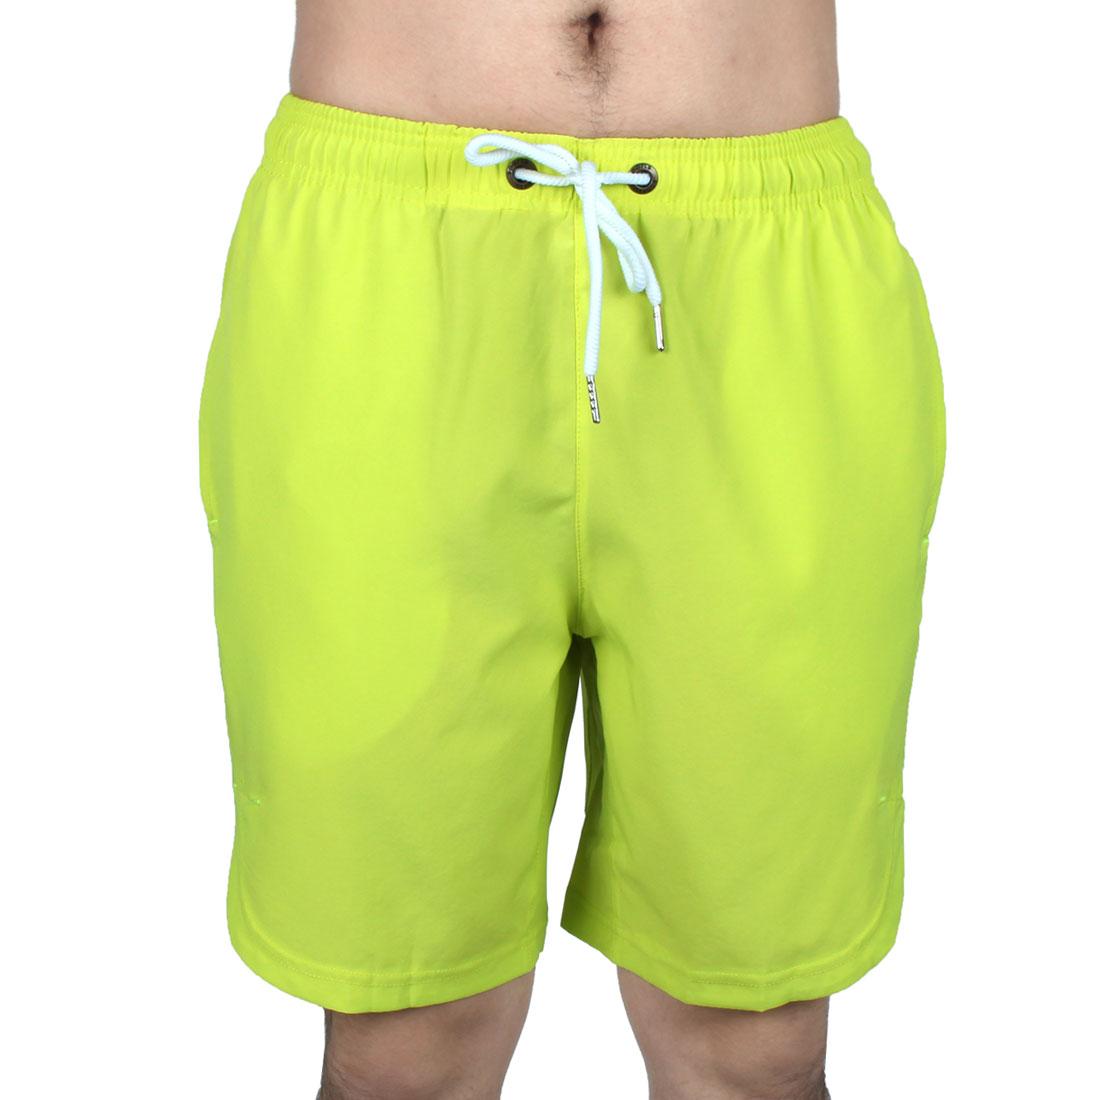 Men Athletics Running Polyester Summer Beach Surf Board Shorts Pants Green W34